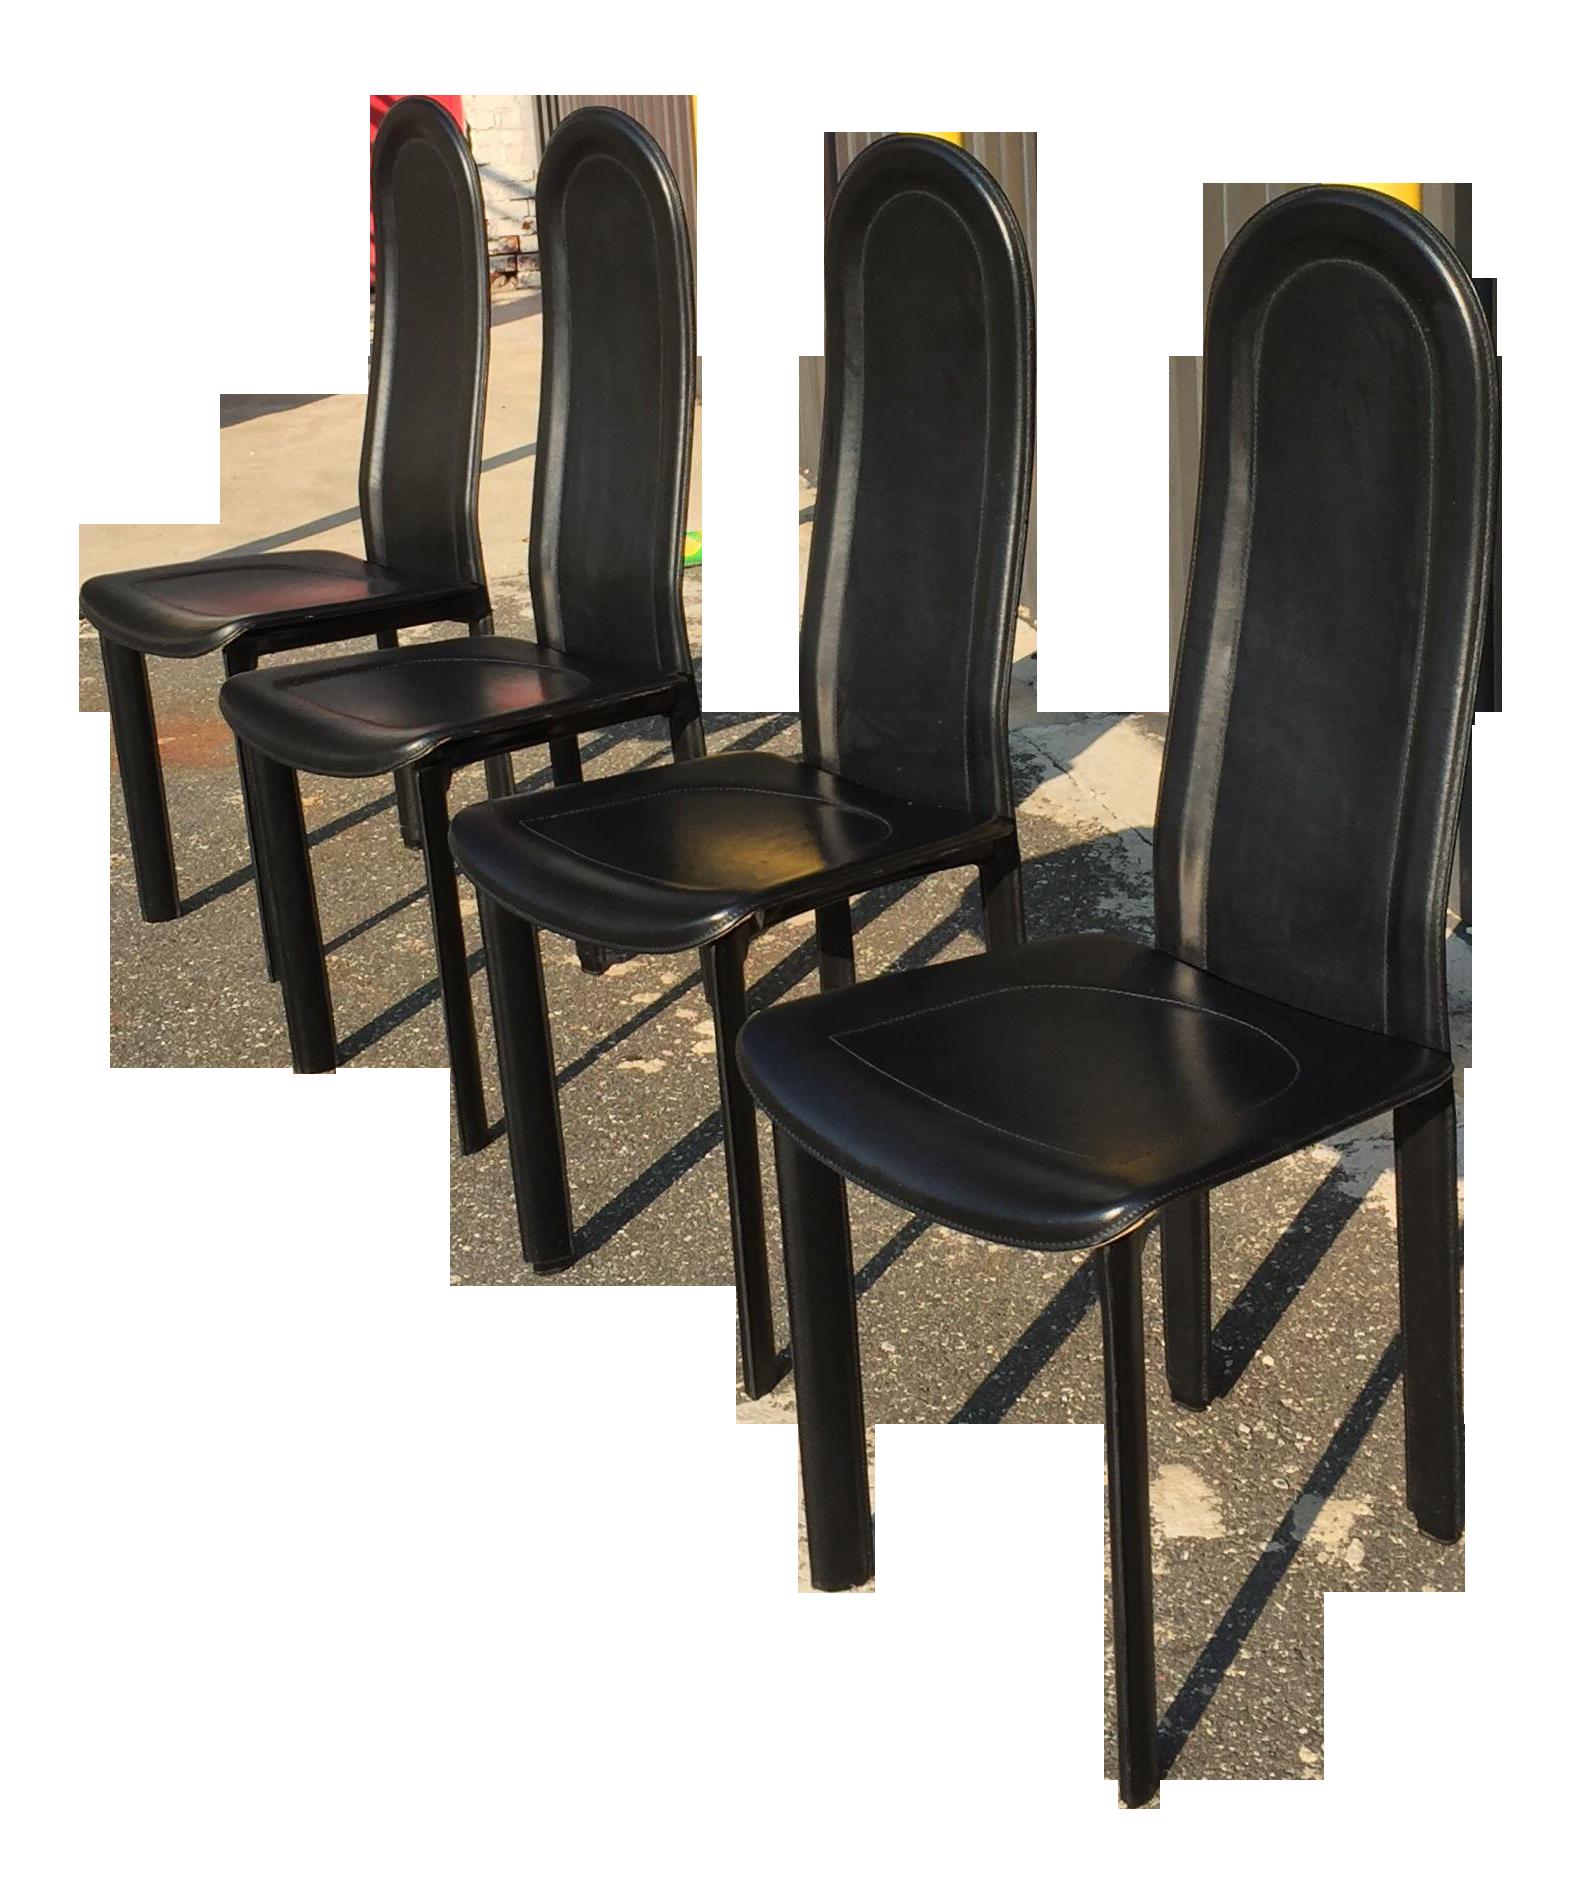 Modern Italian Black Leather Dining Chairs By Artedi Set Of 4 Chairish